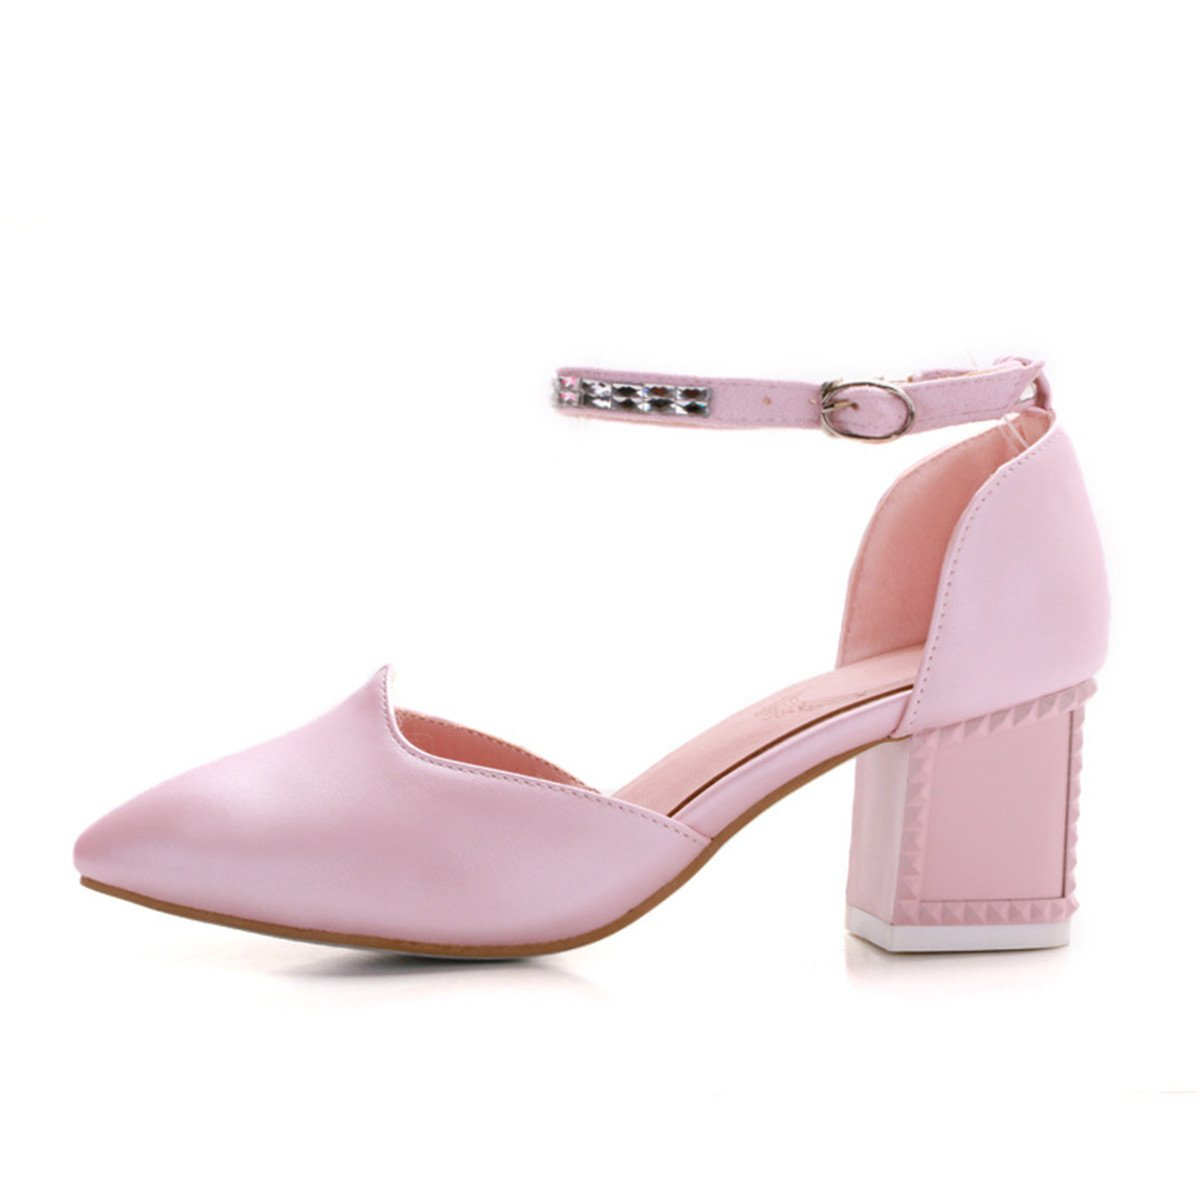 Woherren schuhe Comfort Sandals Walking Walking Walking schuhe   Damen Sandalen   Sandalette Damen Mode Sandalen   Baotou dick mit hochhackigen Schuhe   Damenmode Sandalen 21f760